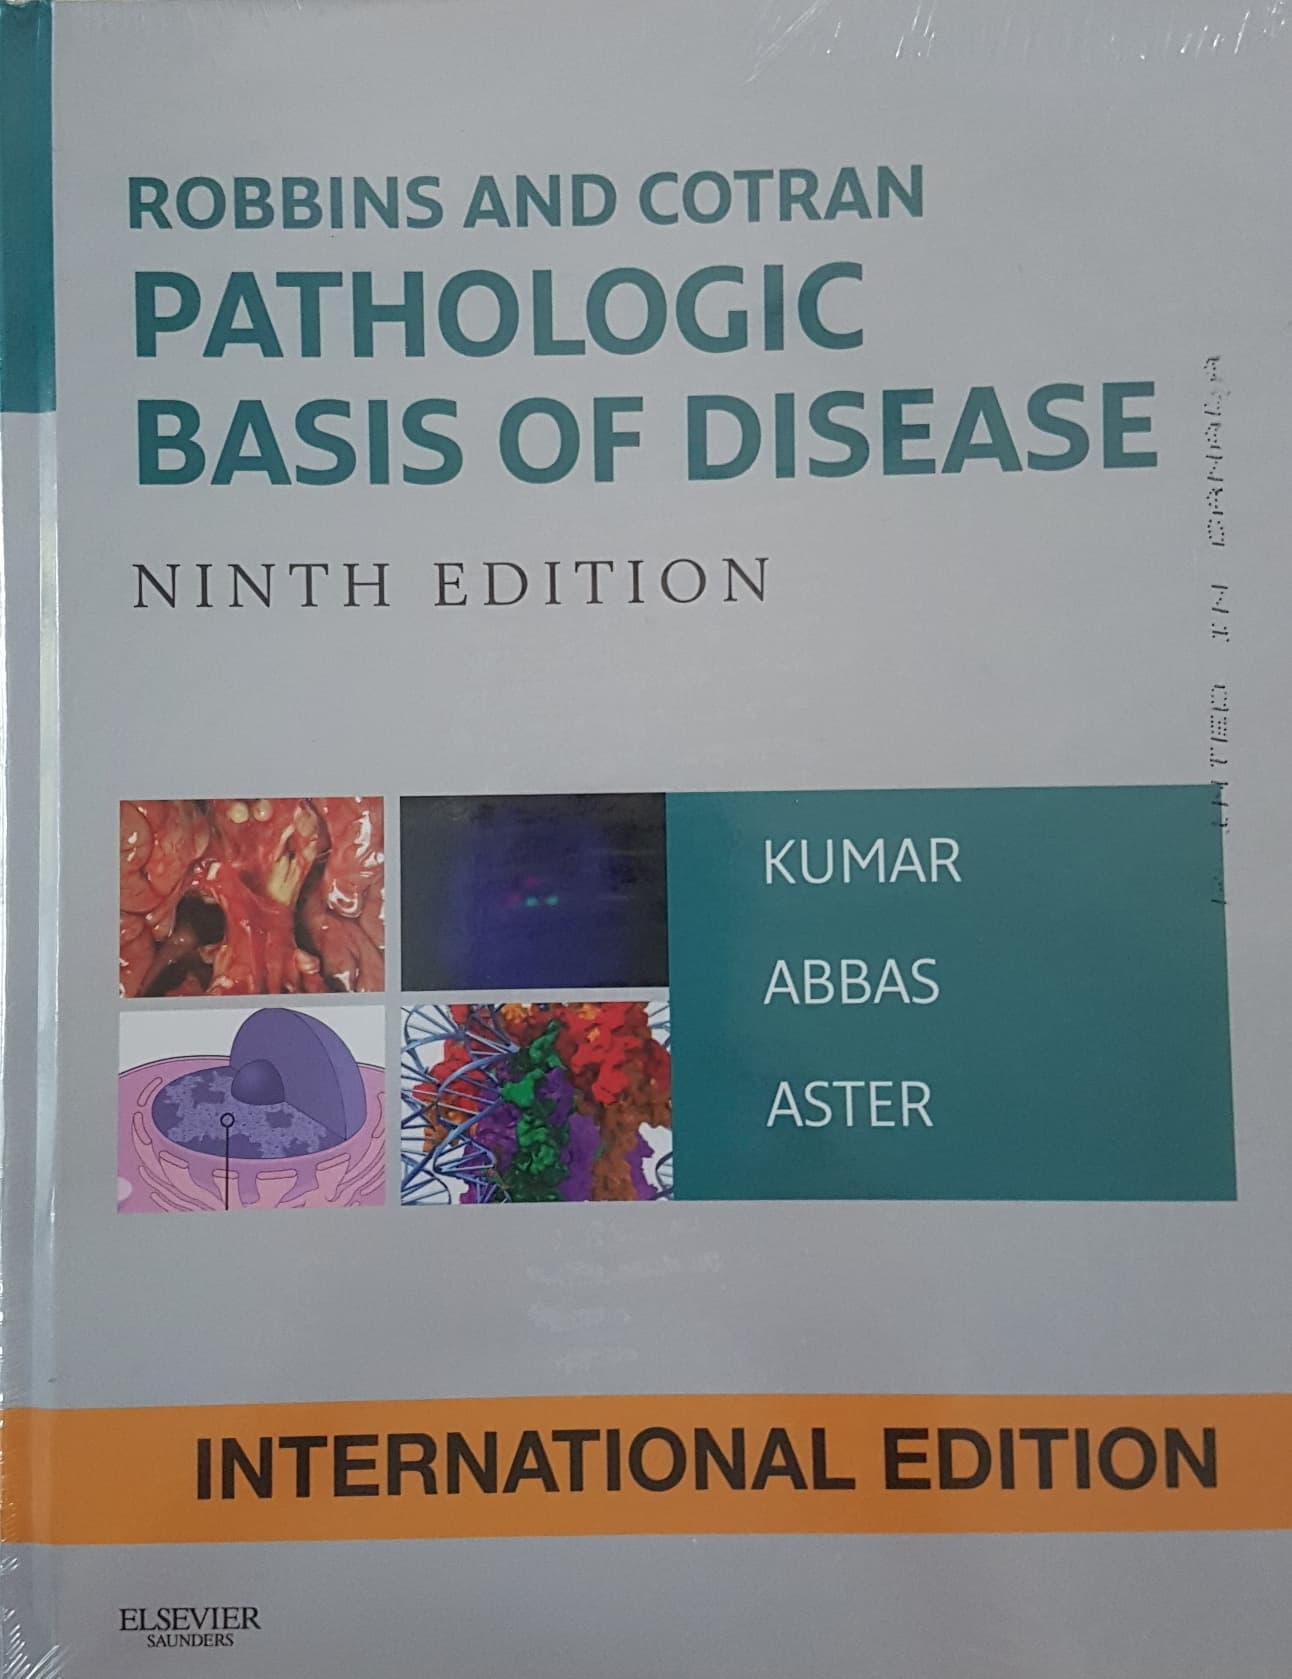 [ORIGINAL] Robbins and Cortran Pathologic Basis of Disease 9e - Kumar